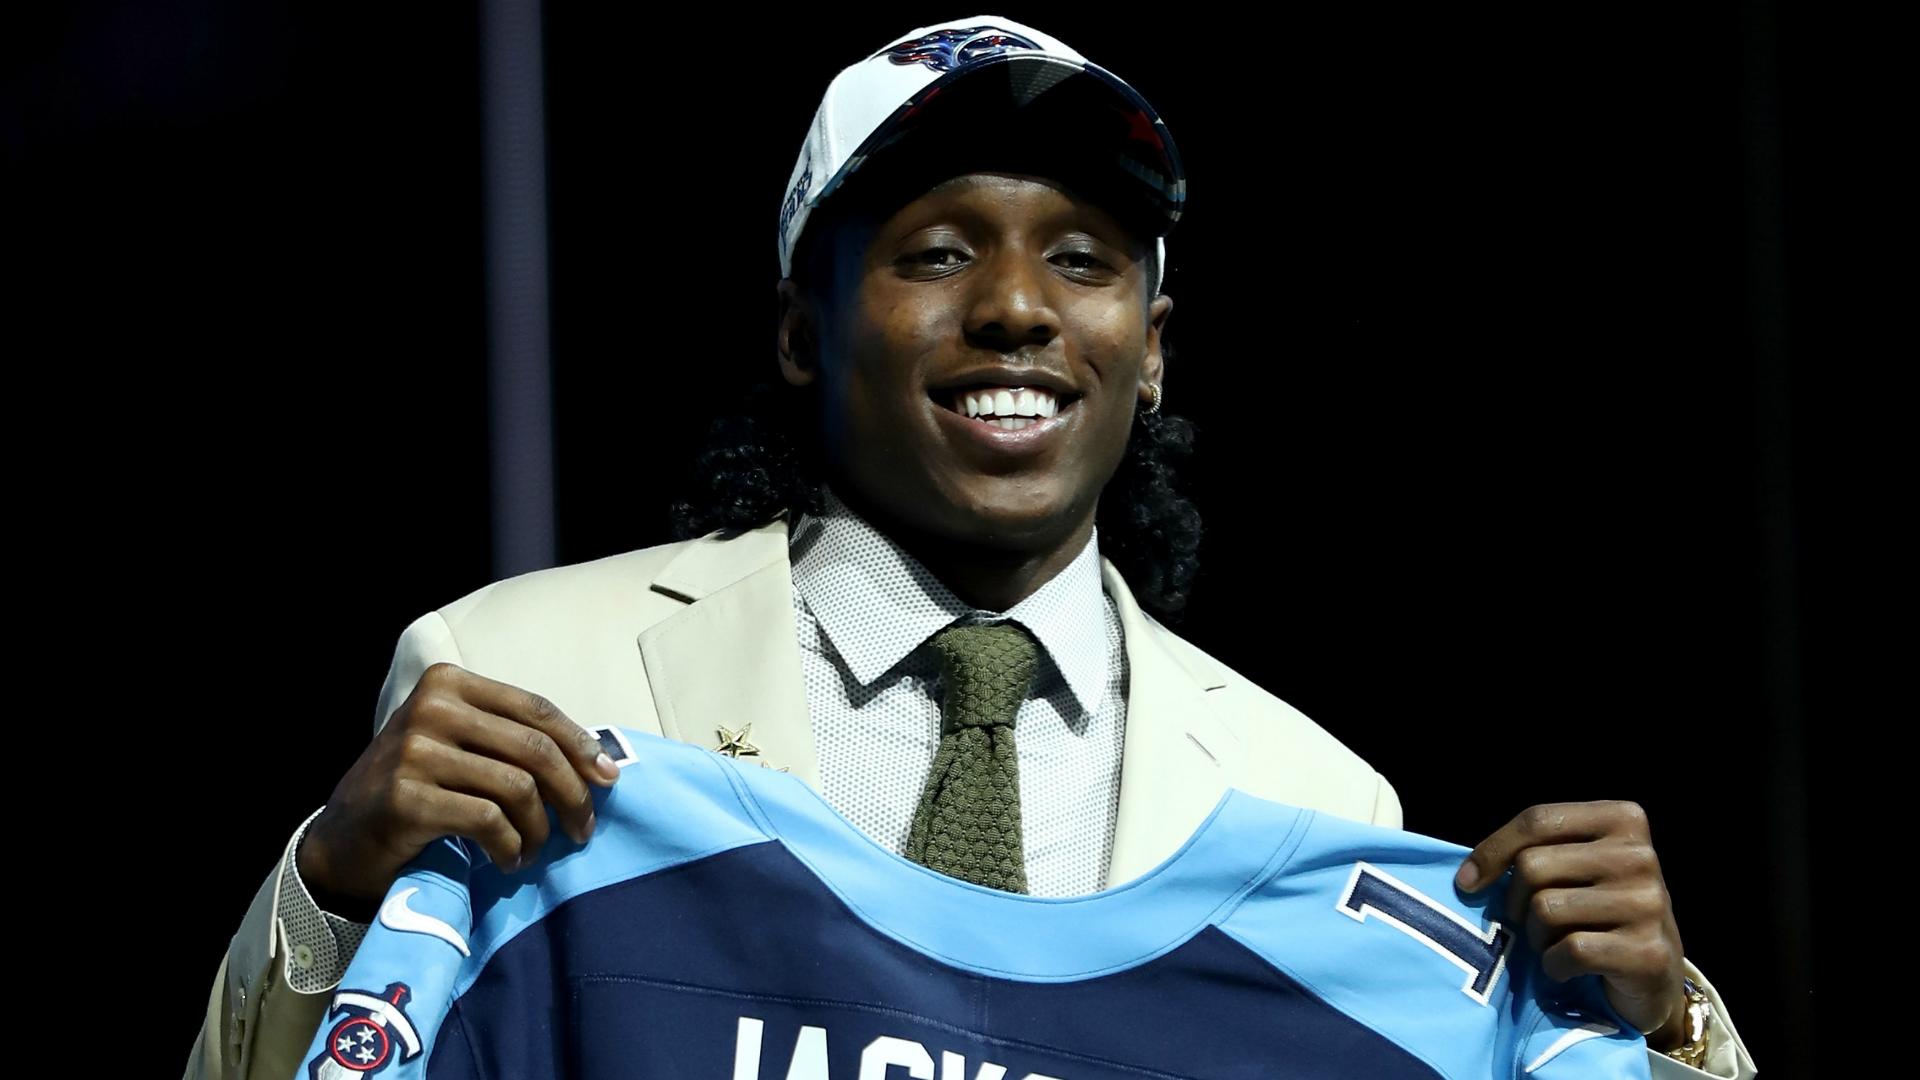 Instant analysis: Tennessee Titans draft Western Michigan's Corey Davis